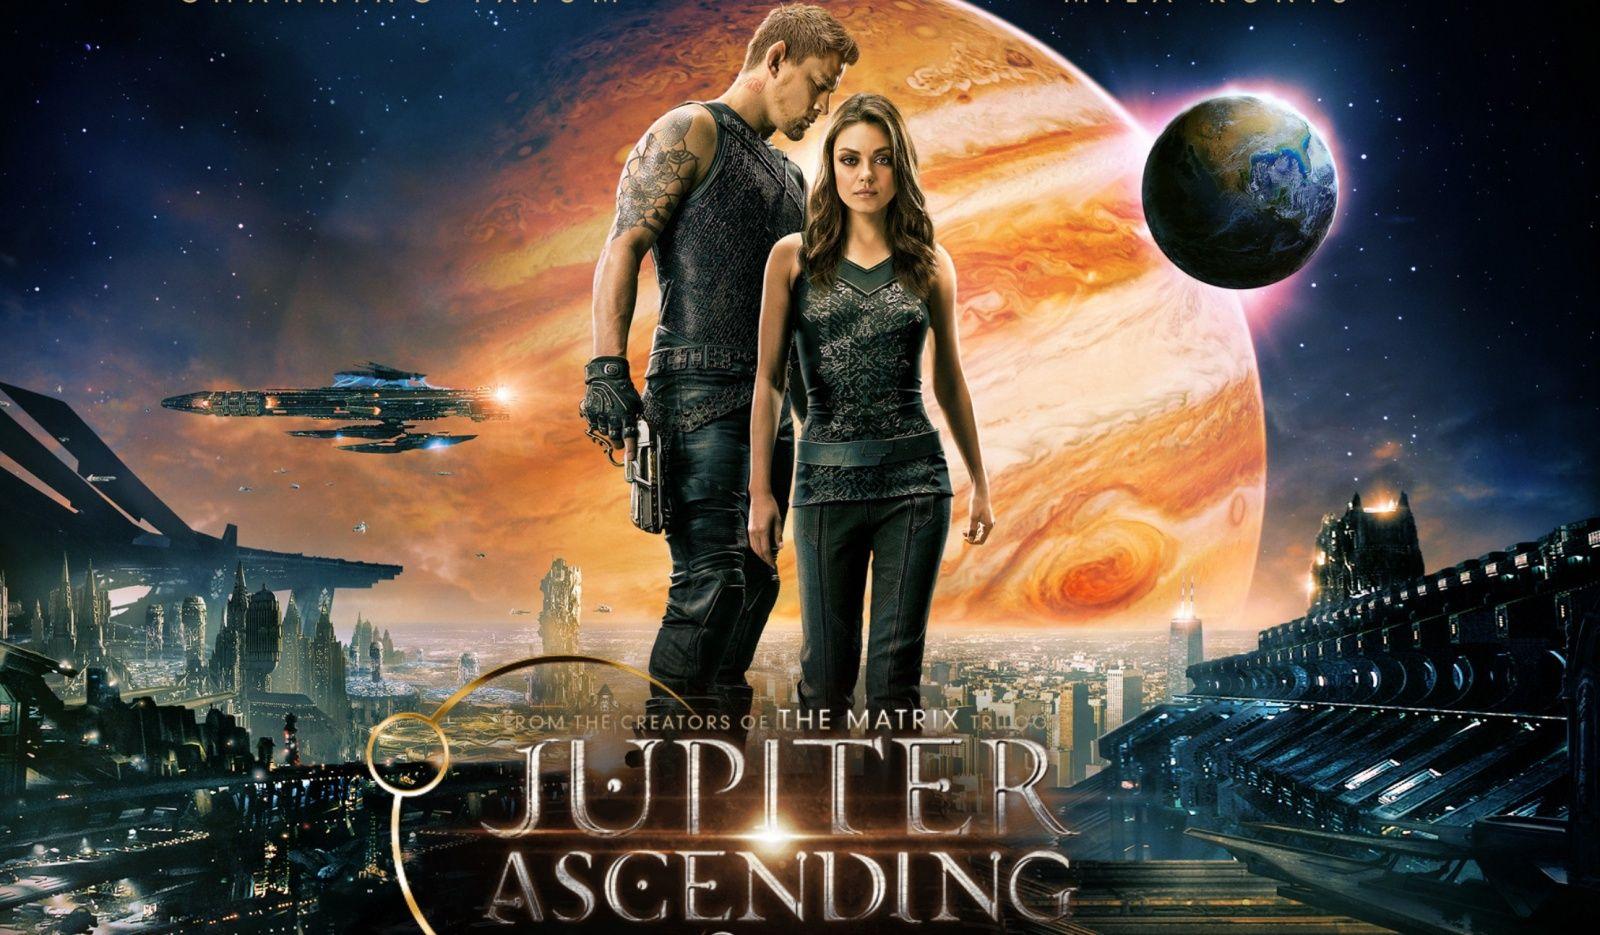 Jupiter Ascending Preview poster starring Mila Kunis and Channing Tatum